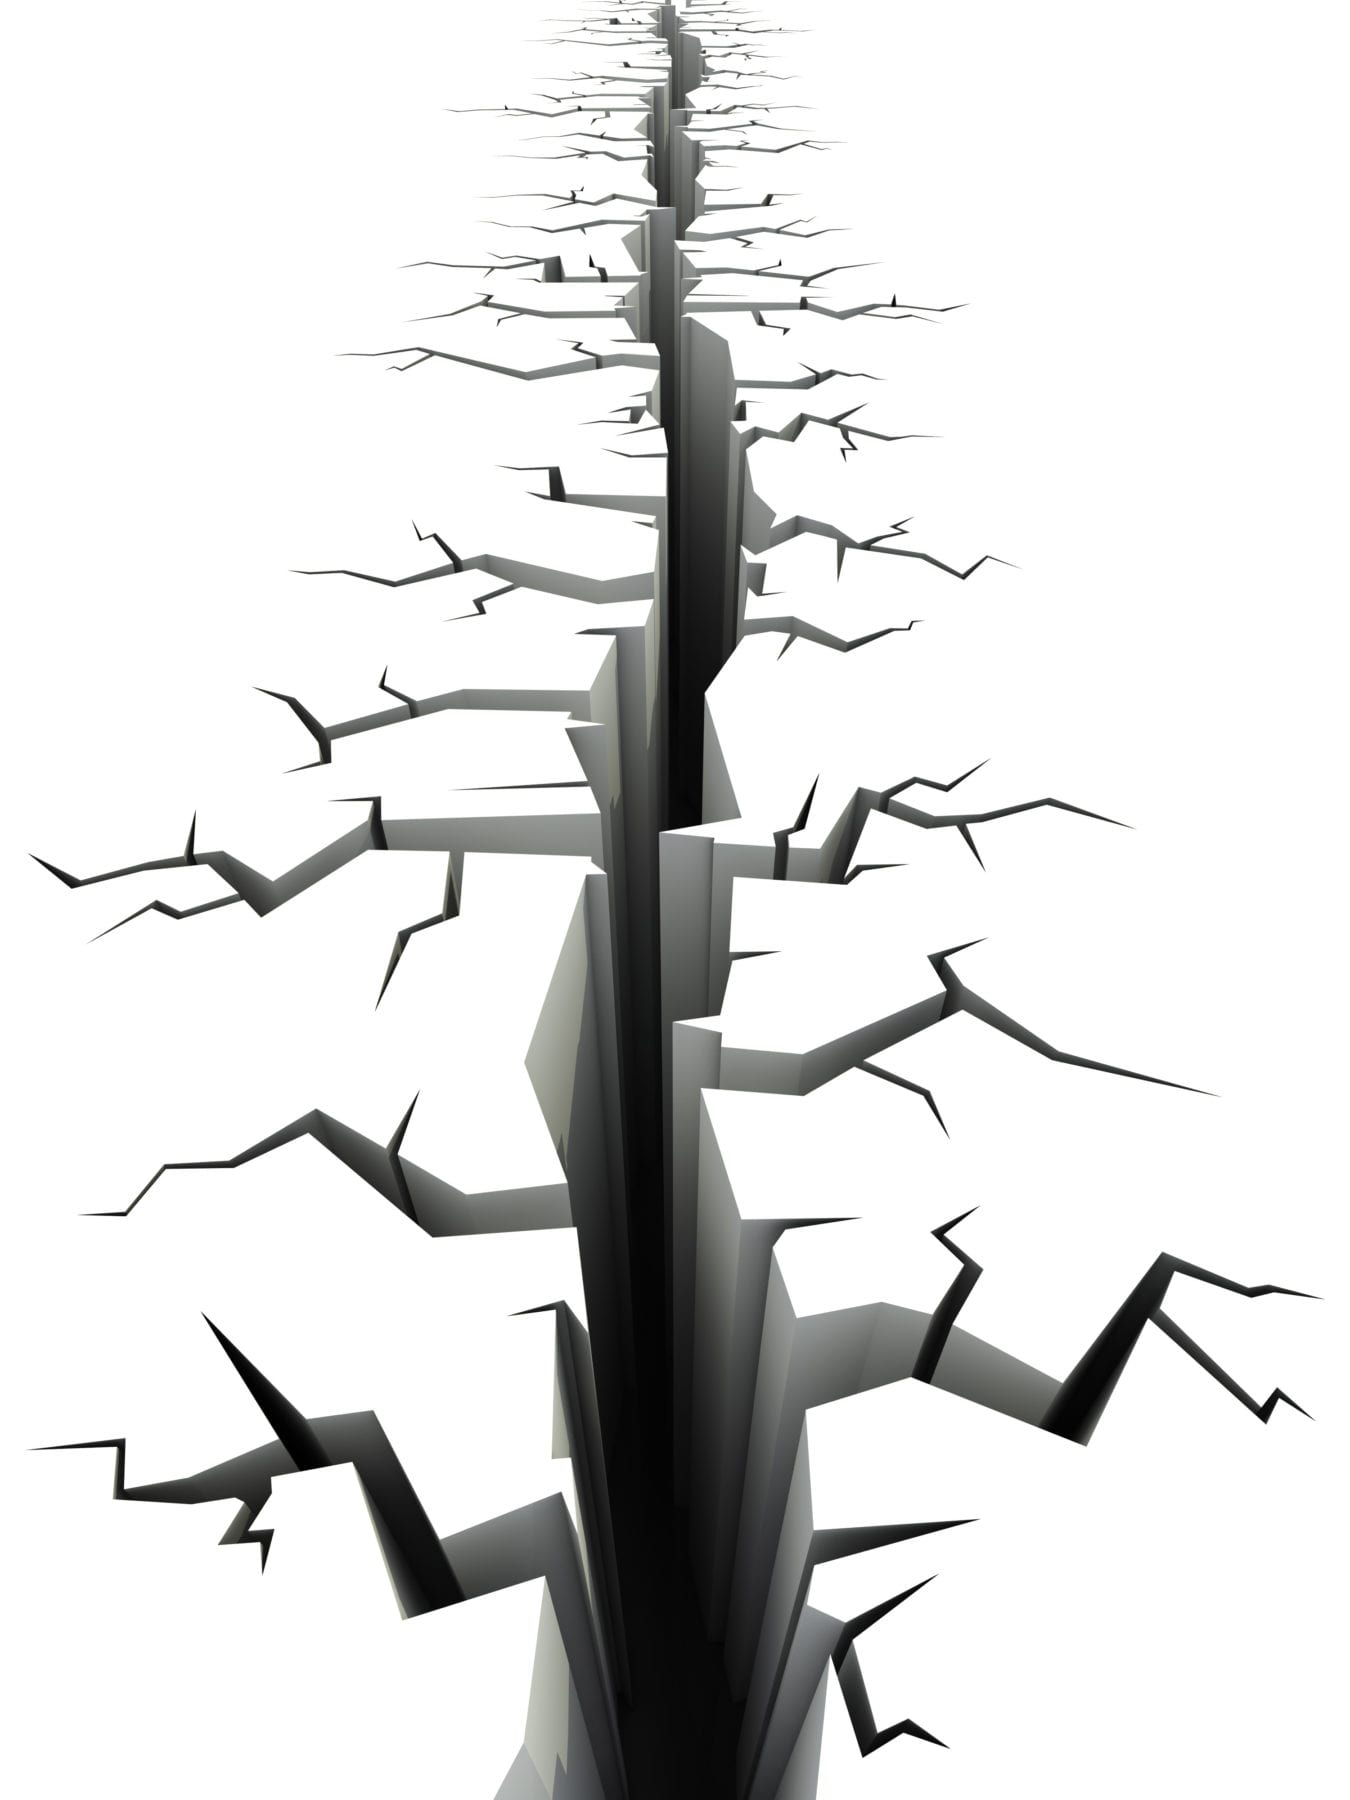 california earthquake insurance , anaheim, dallas, frisco, mckinney, fullerton, brea